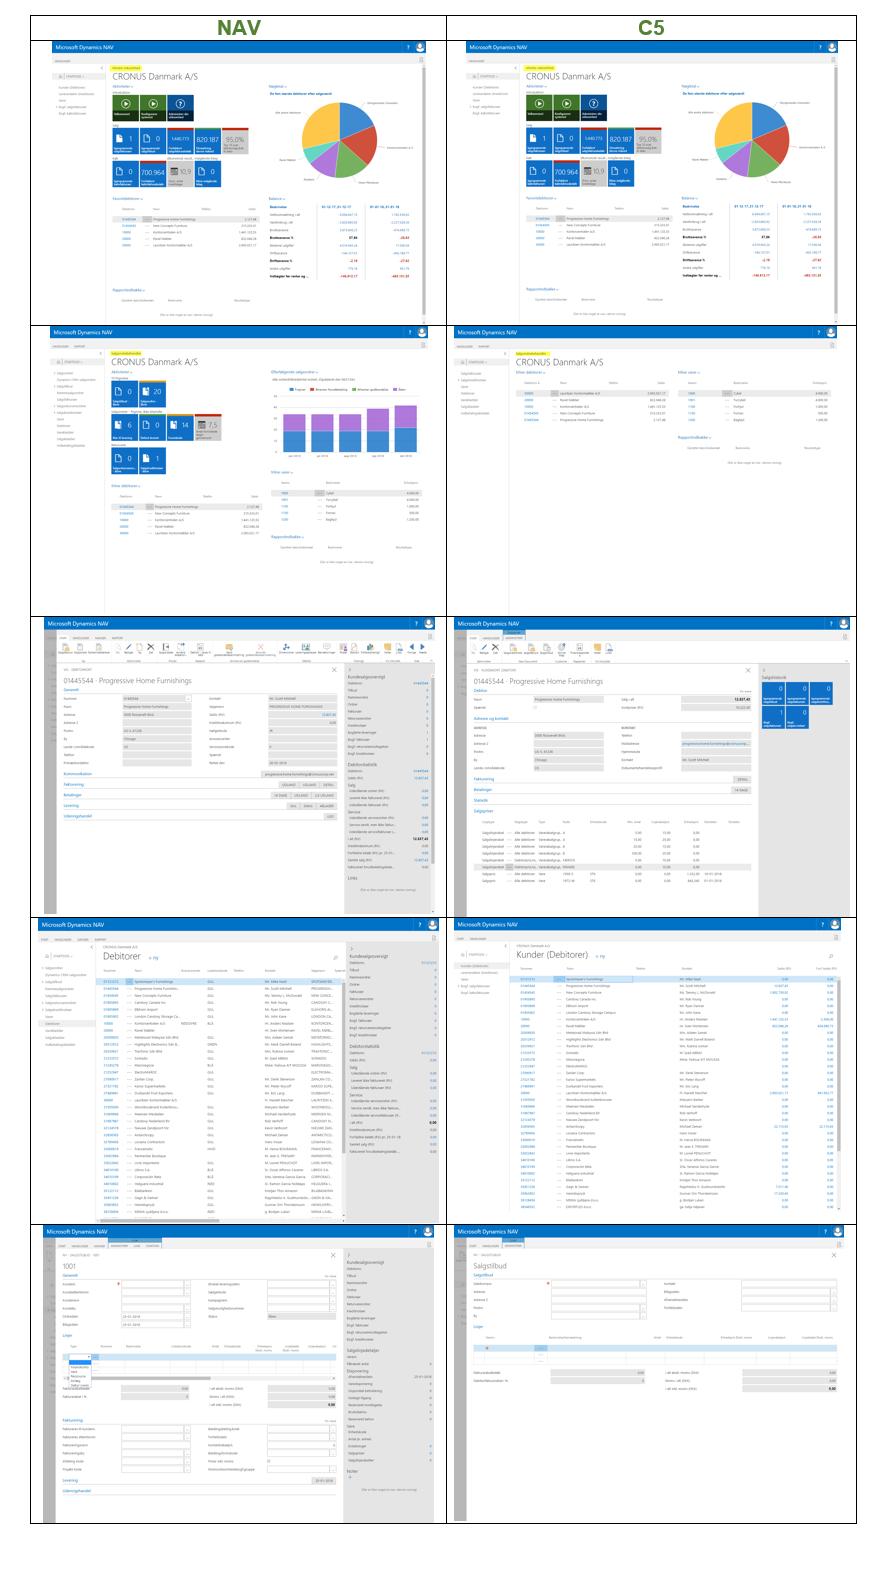 MiniNav - Uniconta og Microsoft Dynamics NAV, C5, XAL